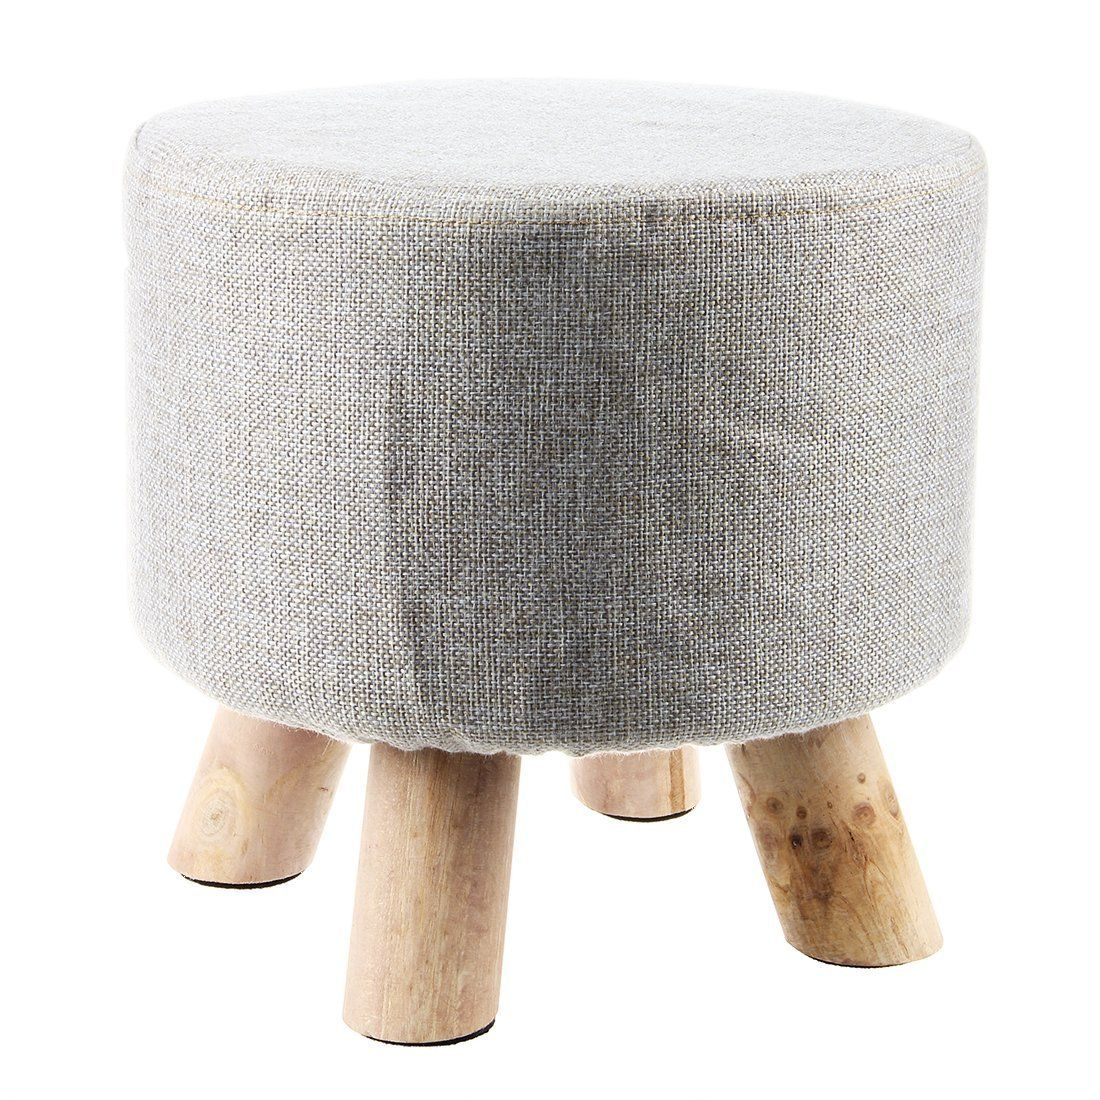 Sodial R Moderner Luxus Gepolsterter Schemel Runder Pouffe Hocker Holz Bein Muster Rund Stoff Gra In 2020 Upholstered Footstool Modern Footstool Upholstered Stool